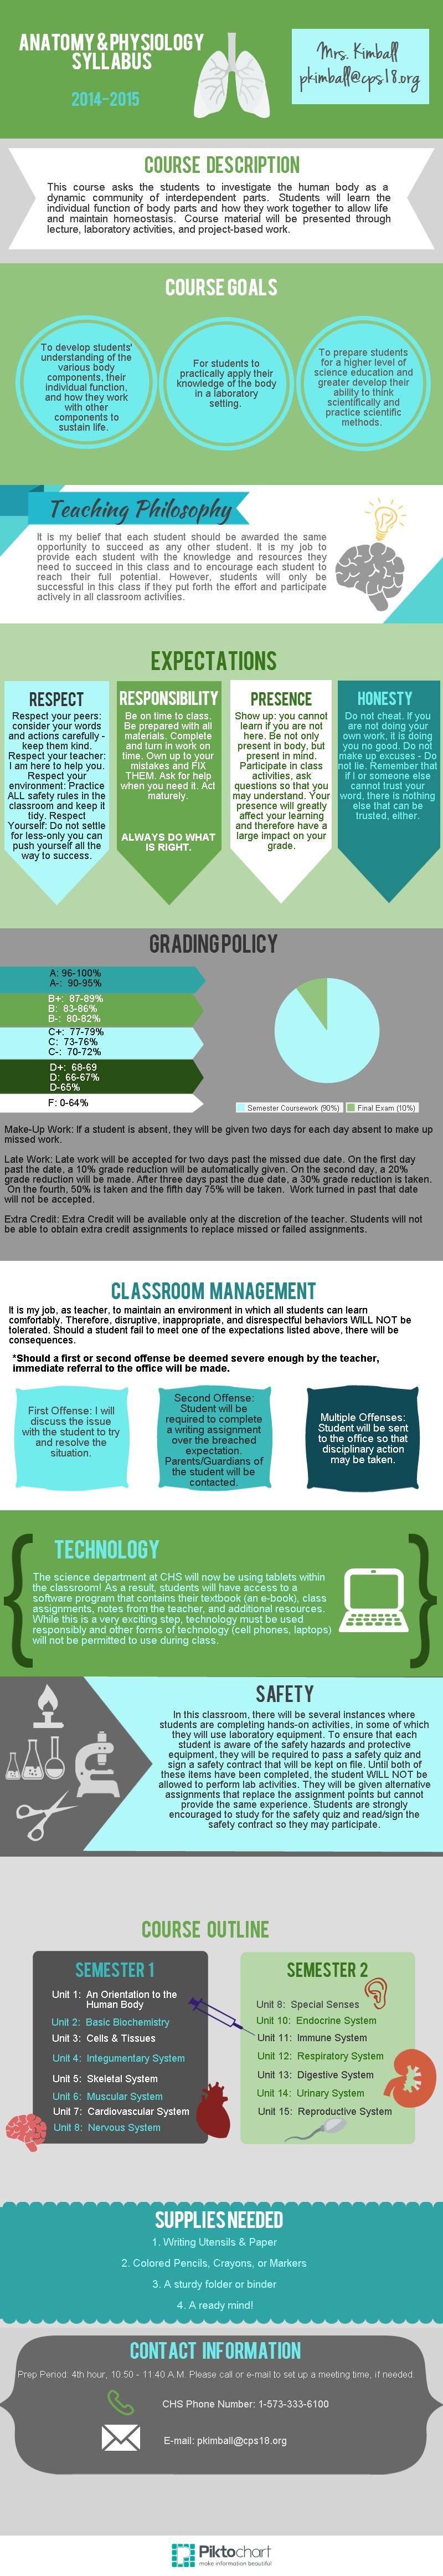 Anatomy & Physiology Syllabus Infographic | Classroom | Pinterest ...